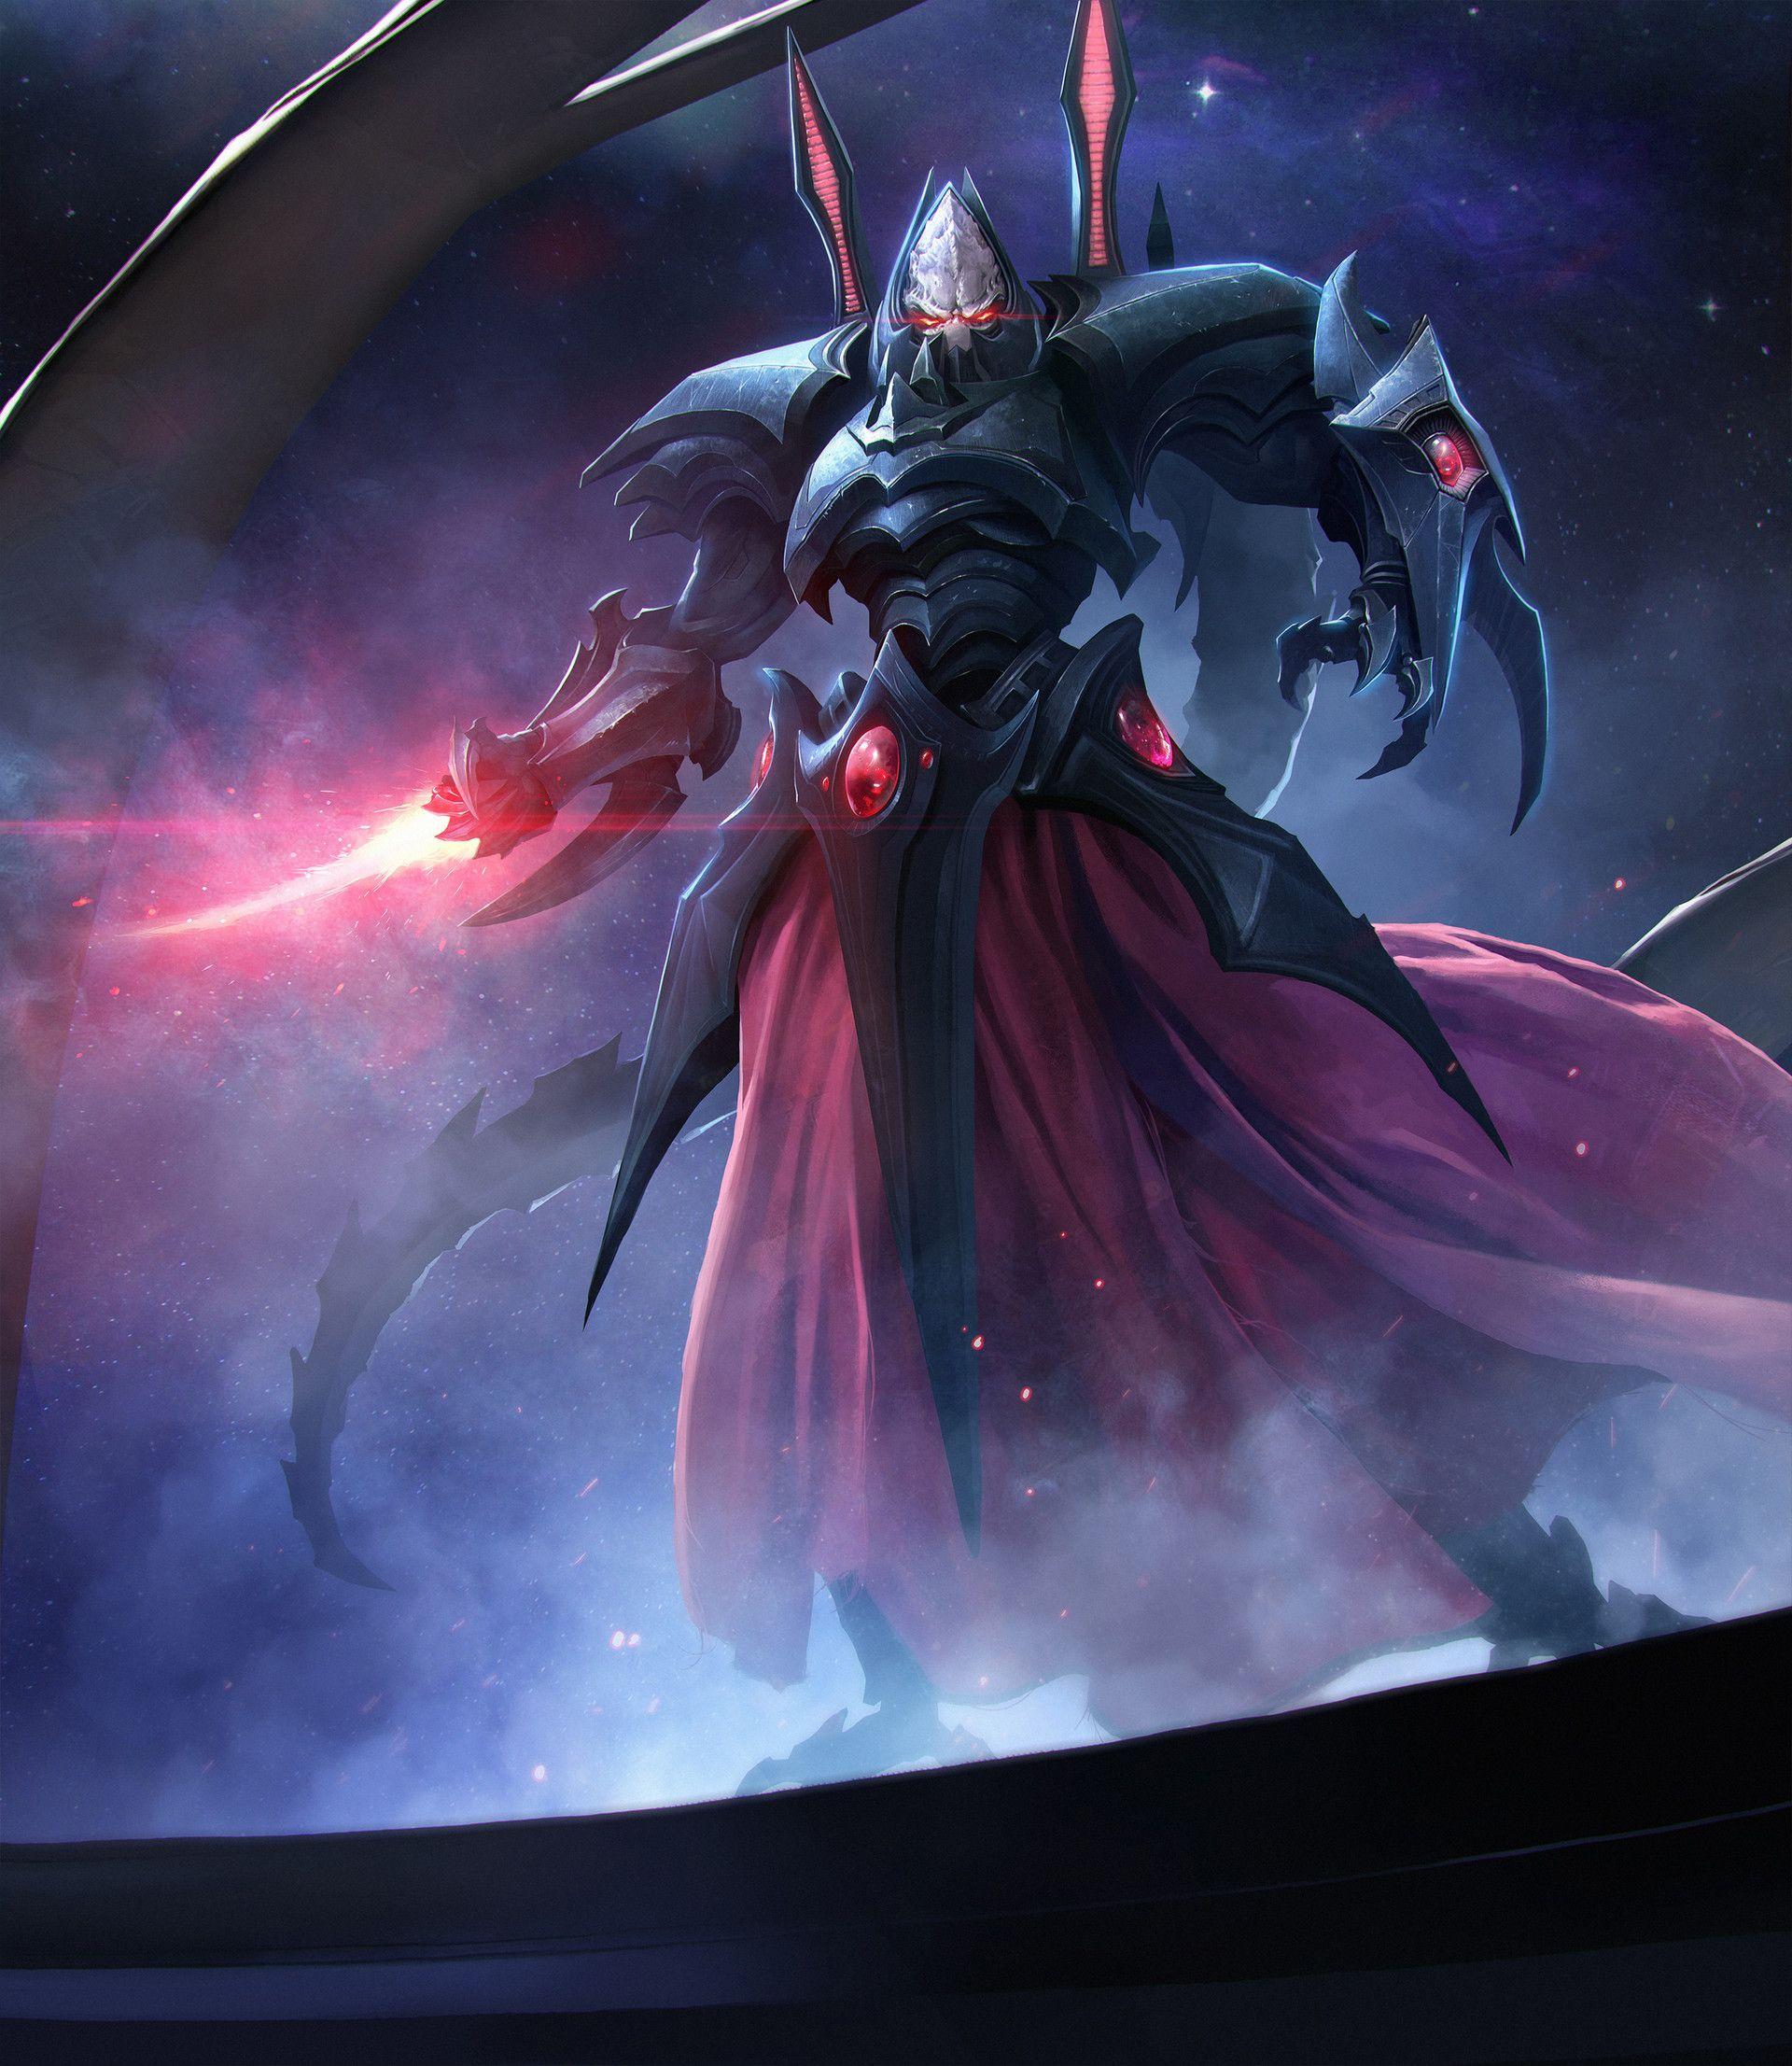 Alarak-Starcraft-Characters-Starcraft-Blizzard-3998621